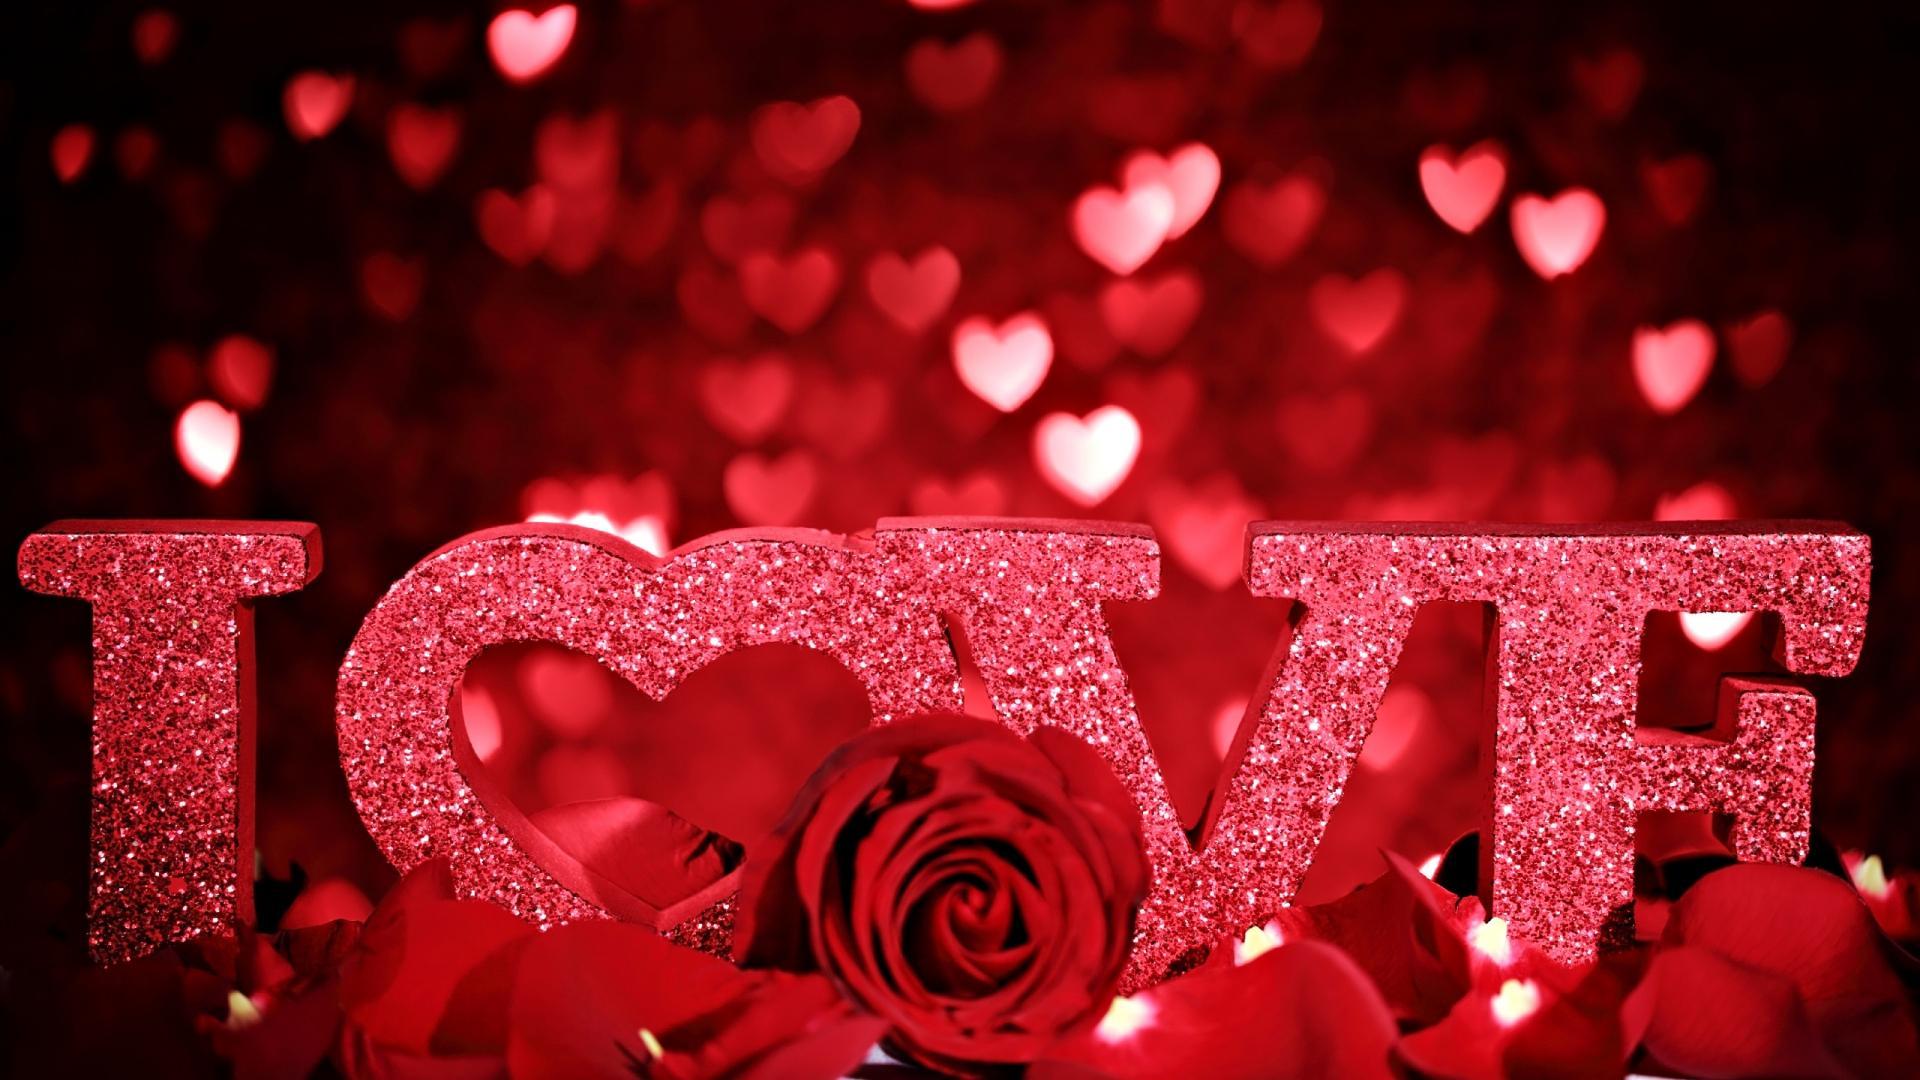 Roses I Love You Wallpaper